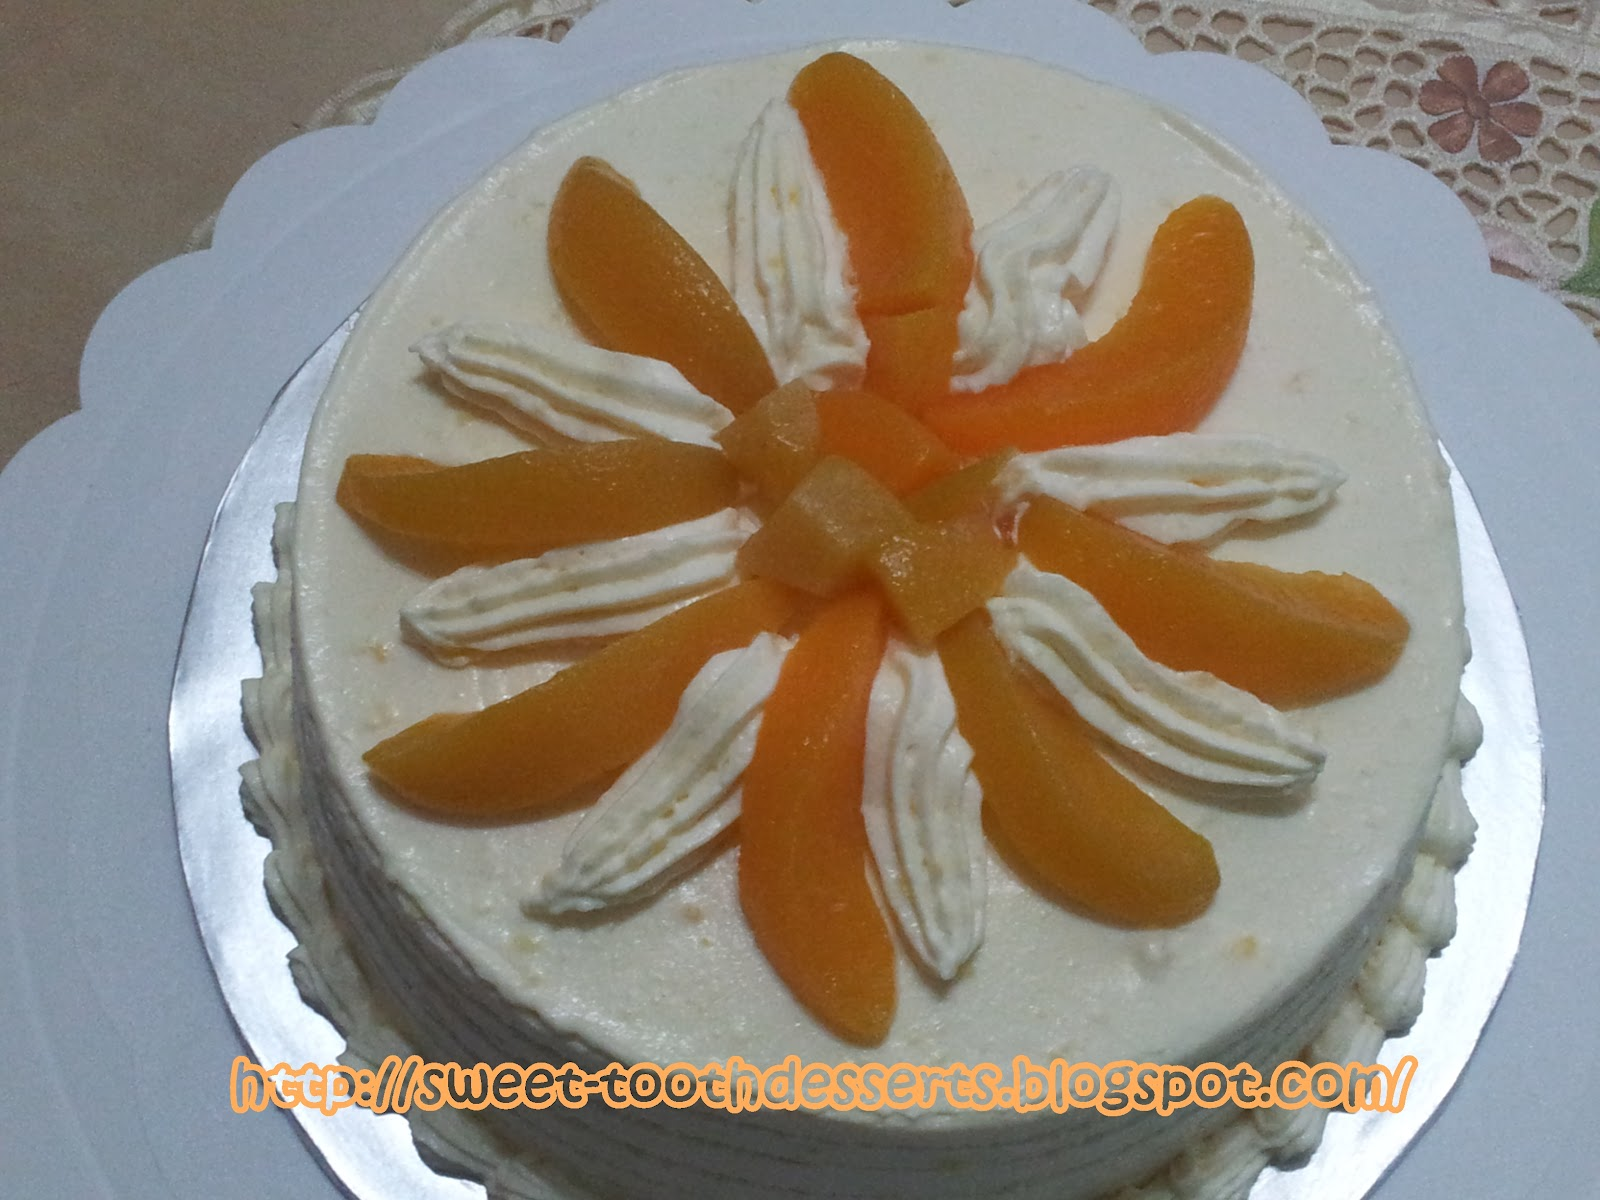 Snowy Peach Custard Cream Cake Recipe